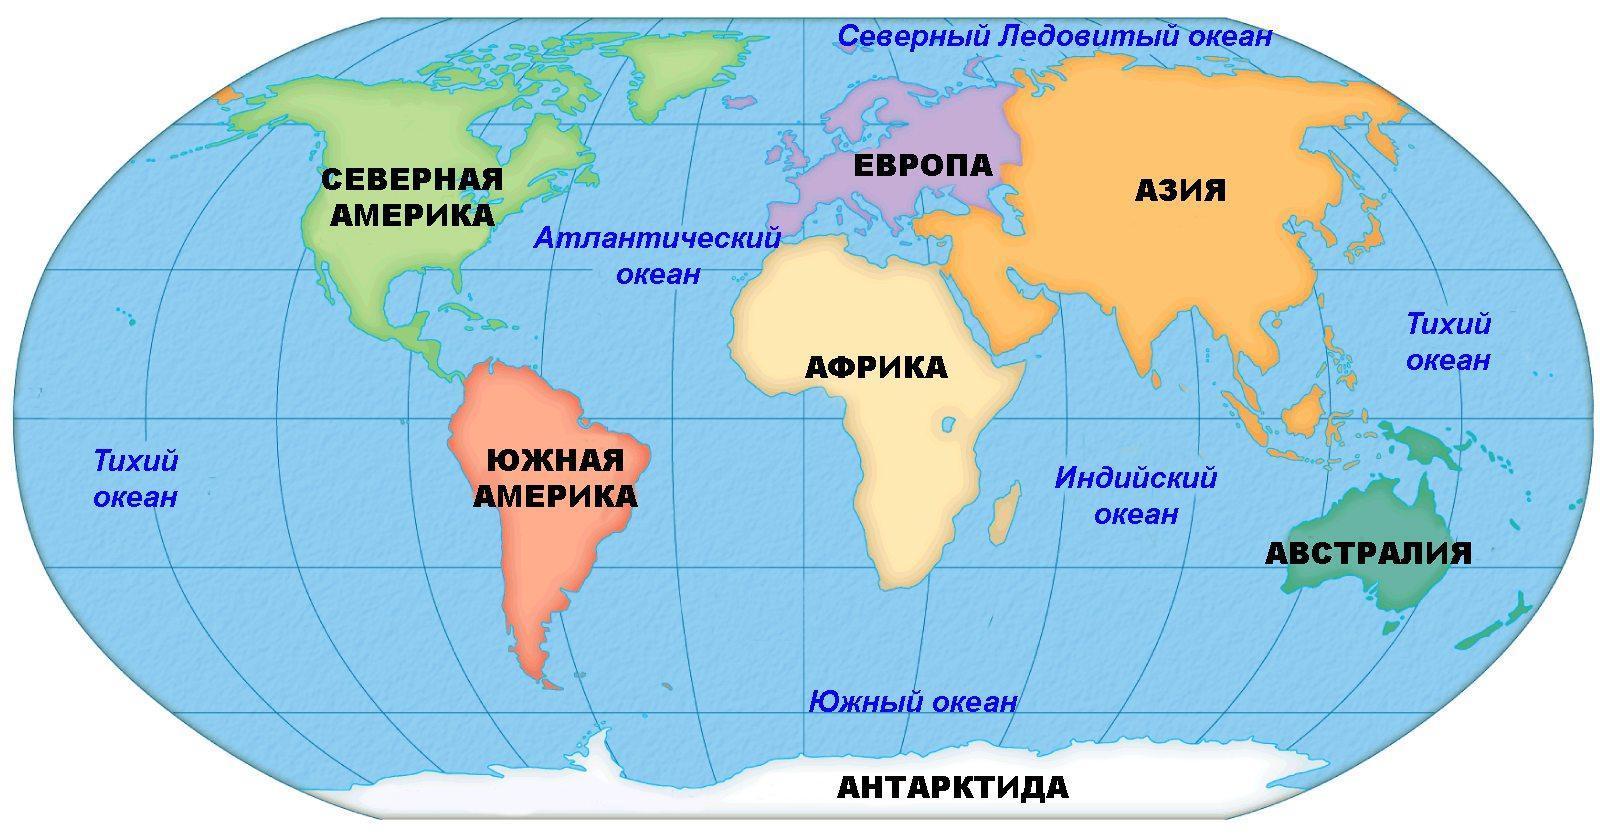 Картинки по запросу карта Океанов